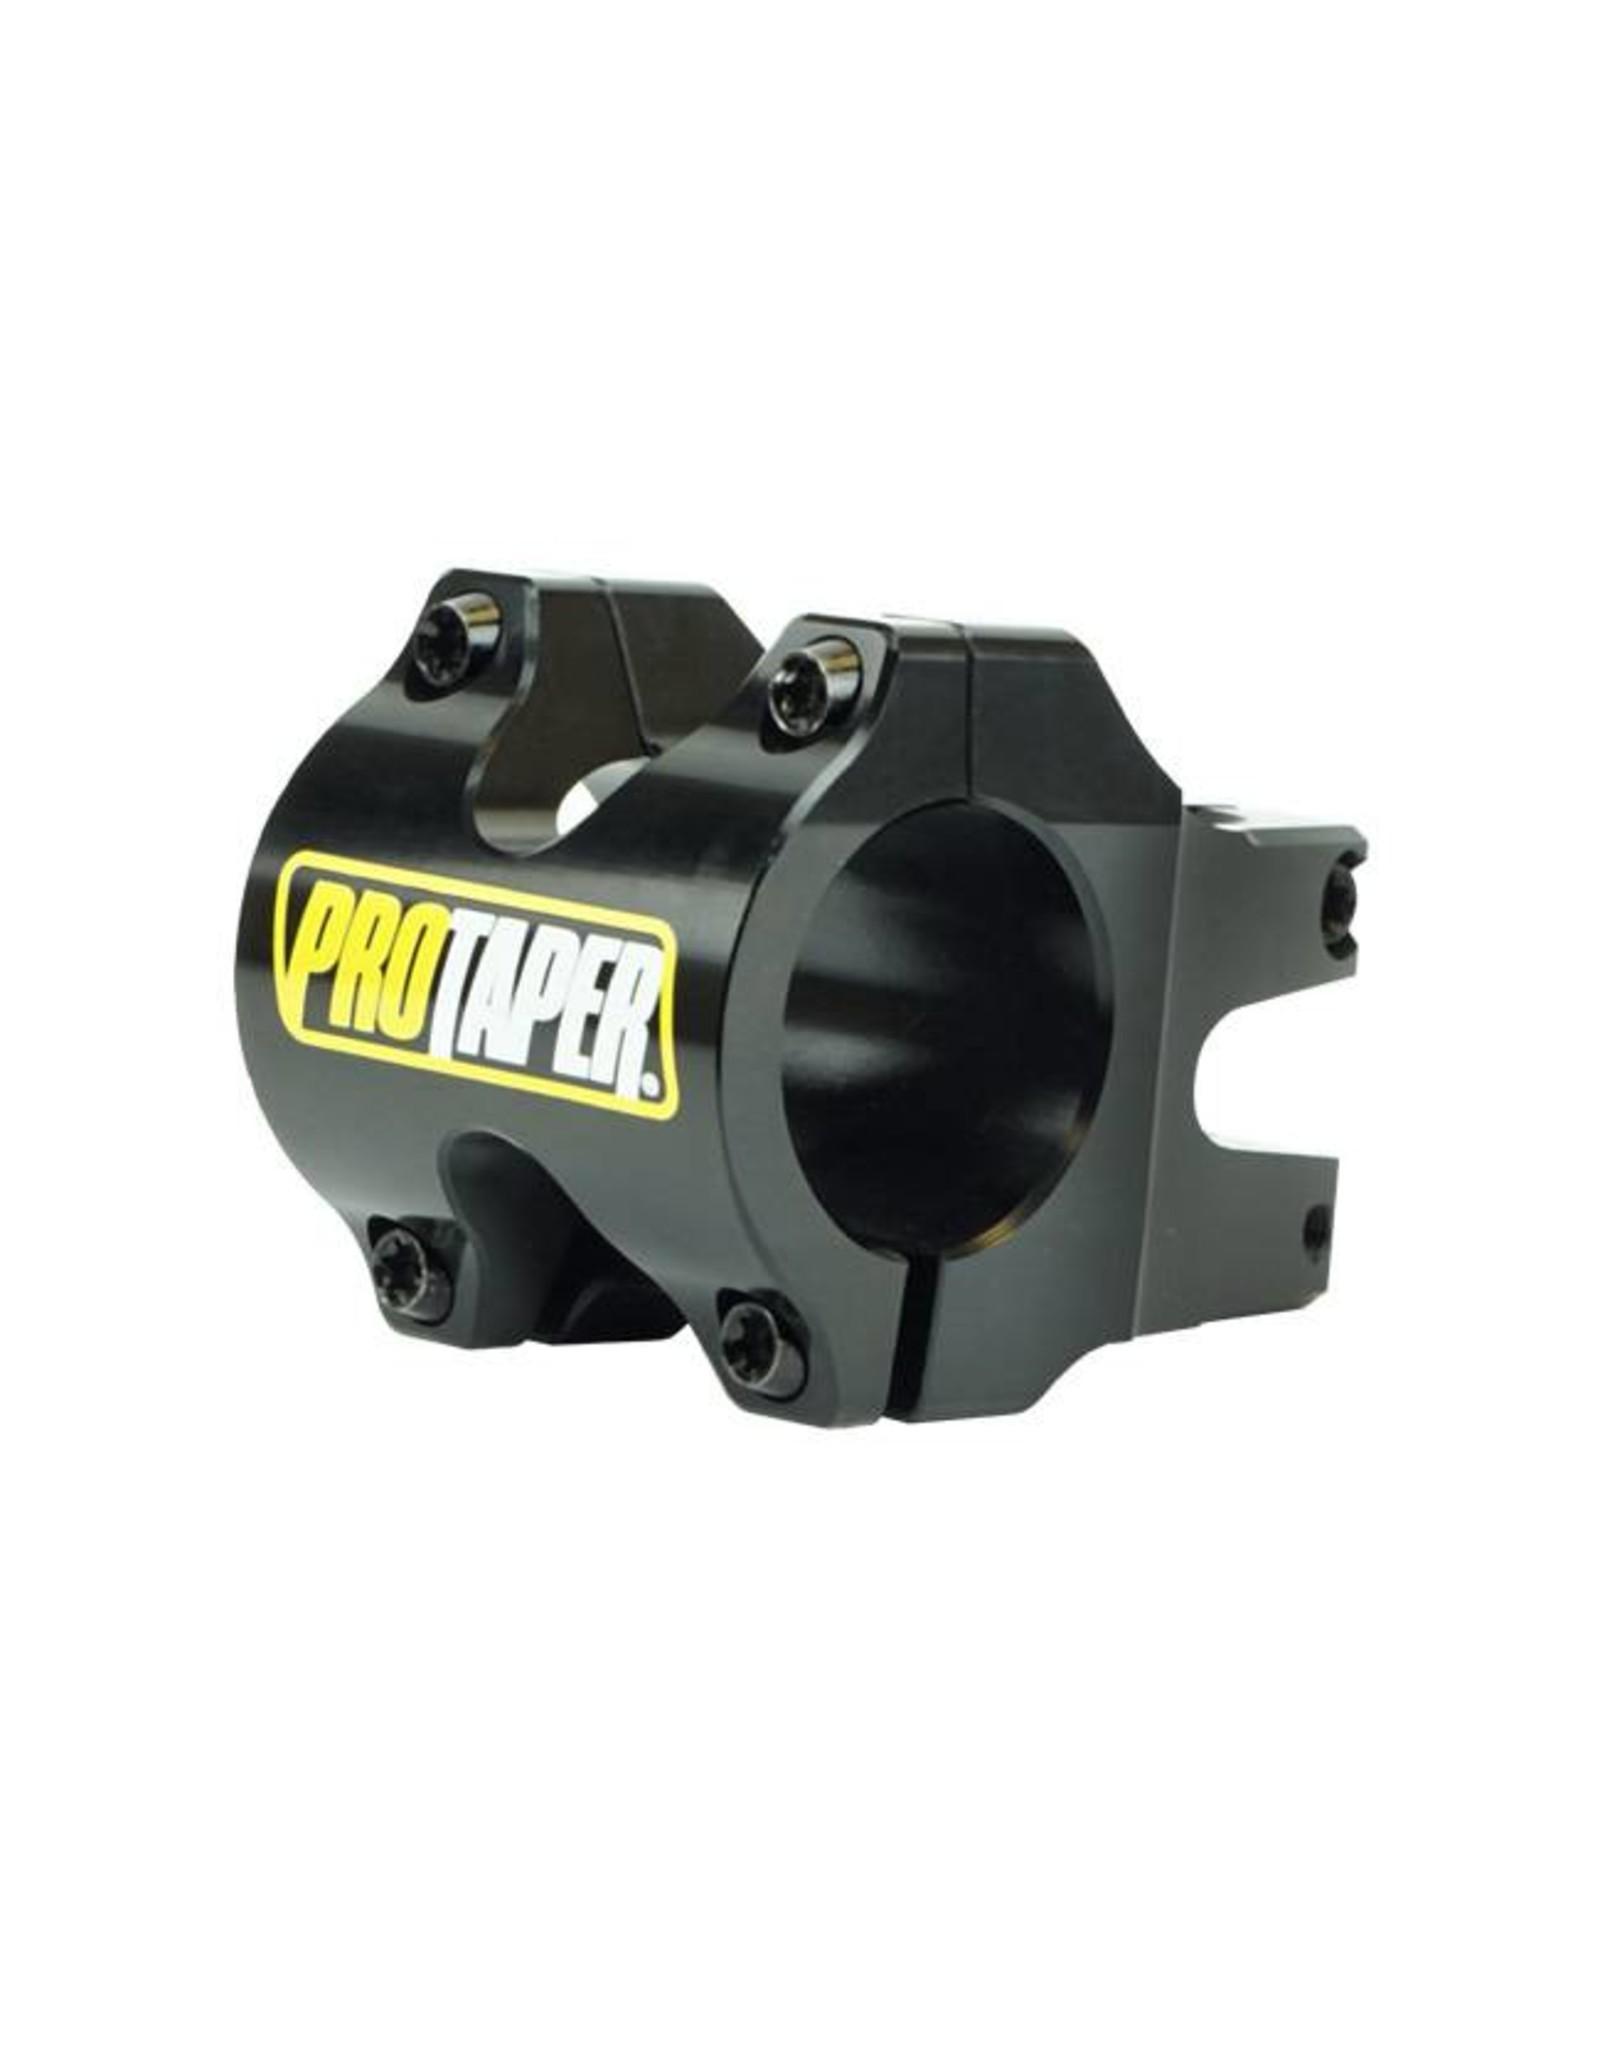 ProTaper ProTaper Stem, 35mm, 31.8mm Bar Clamp, Black